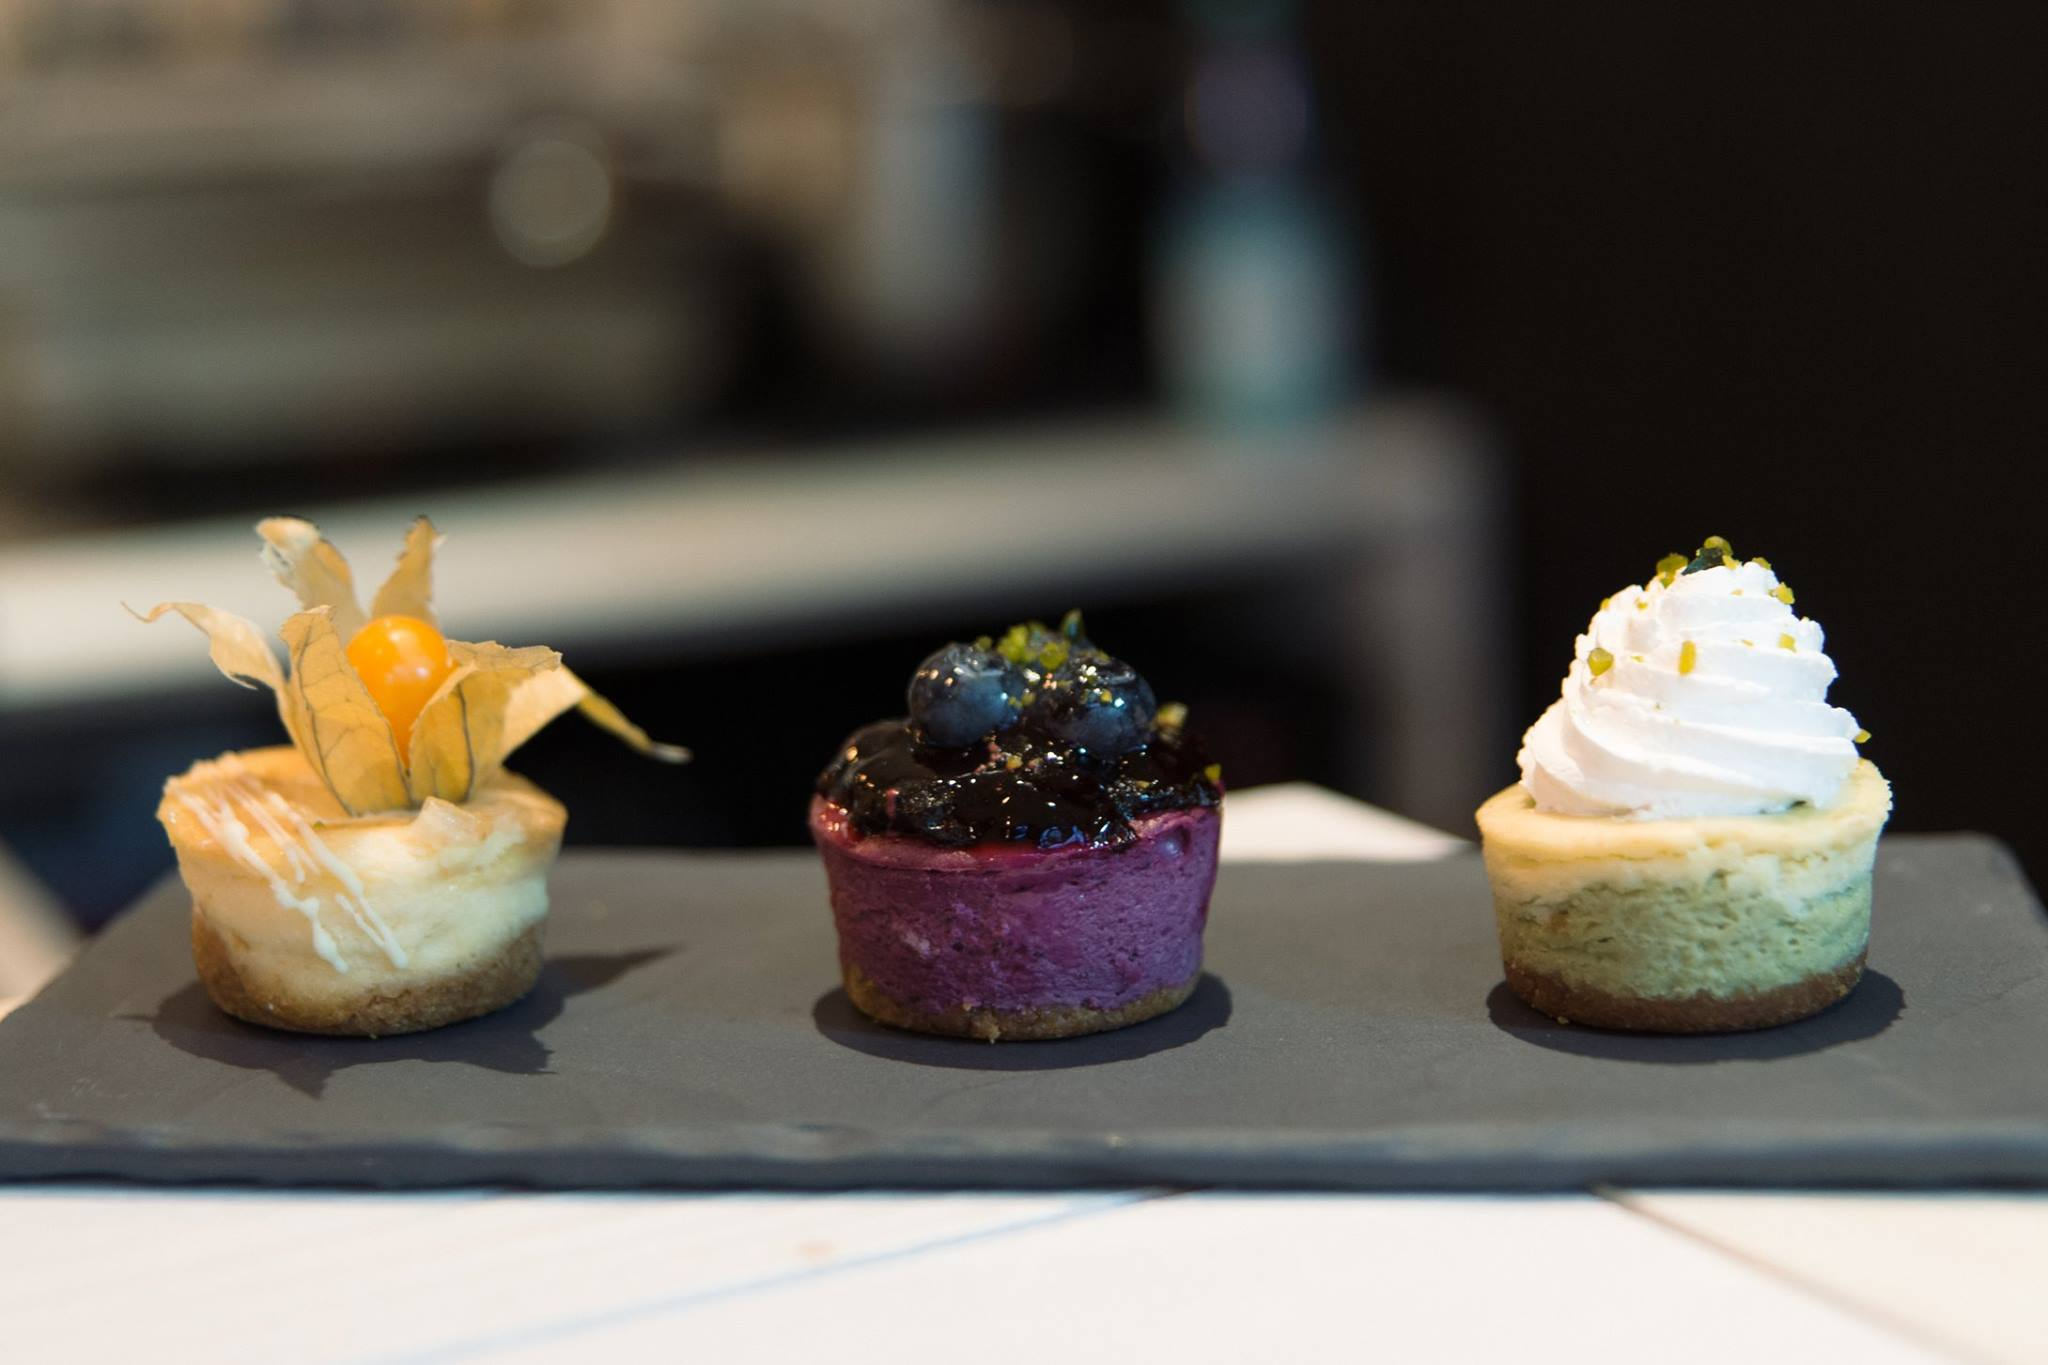 Food by Ricarda Farnbacher - Dessert